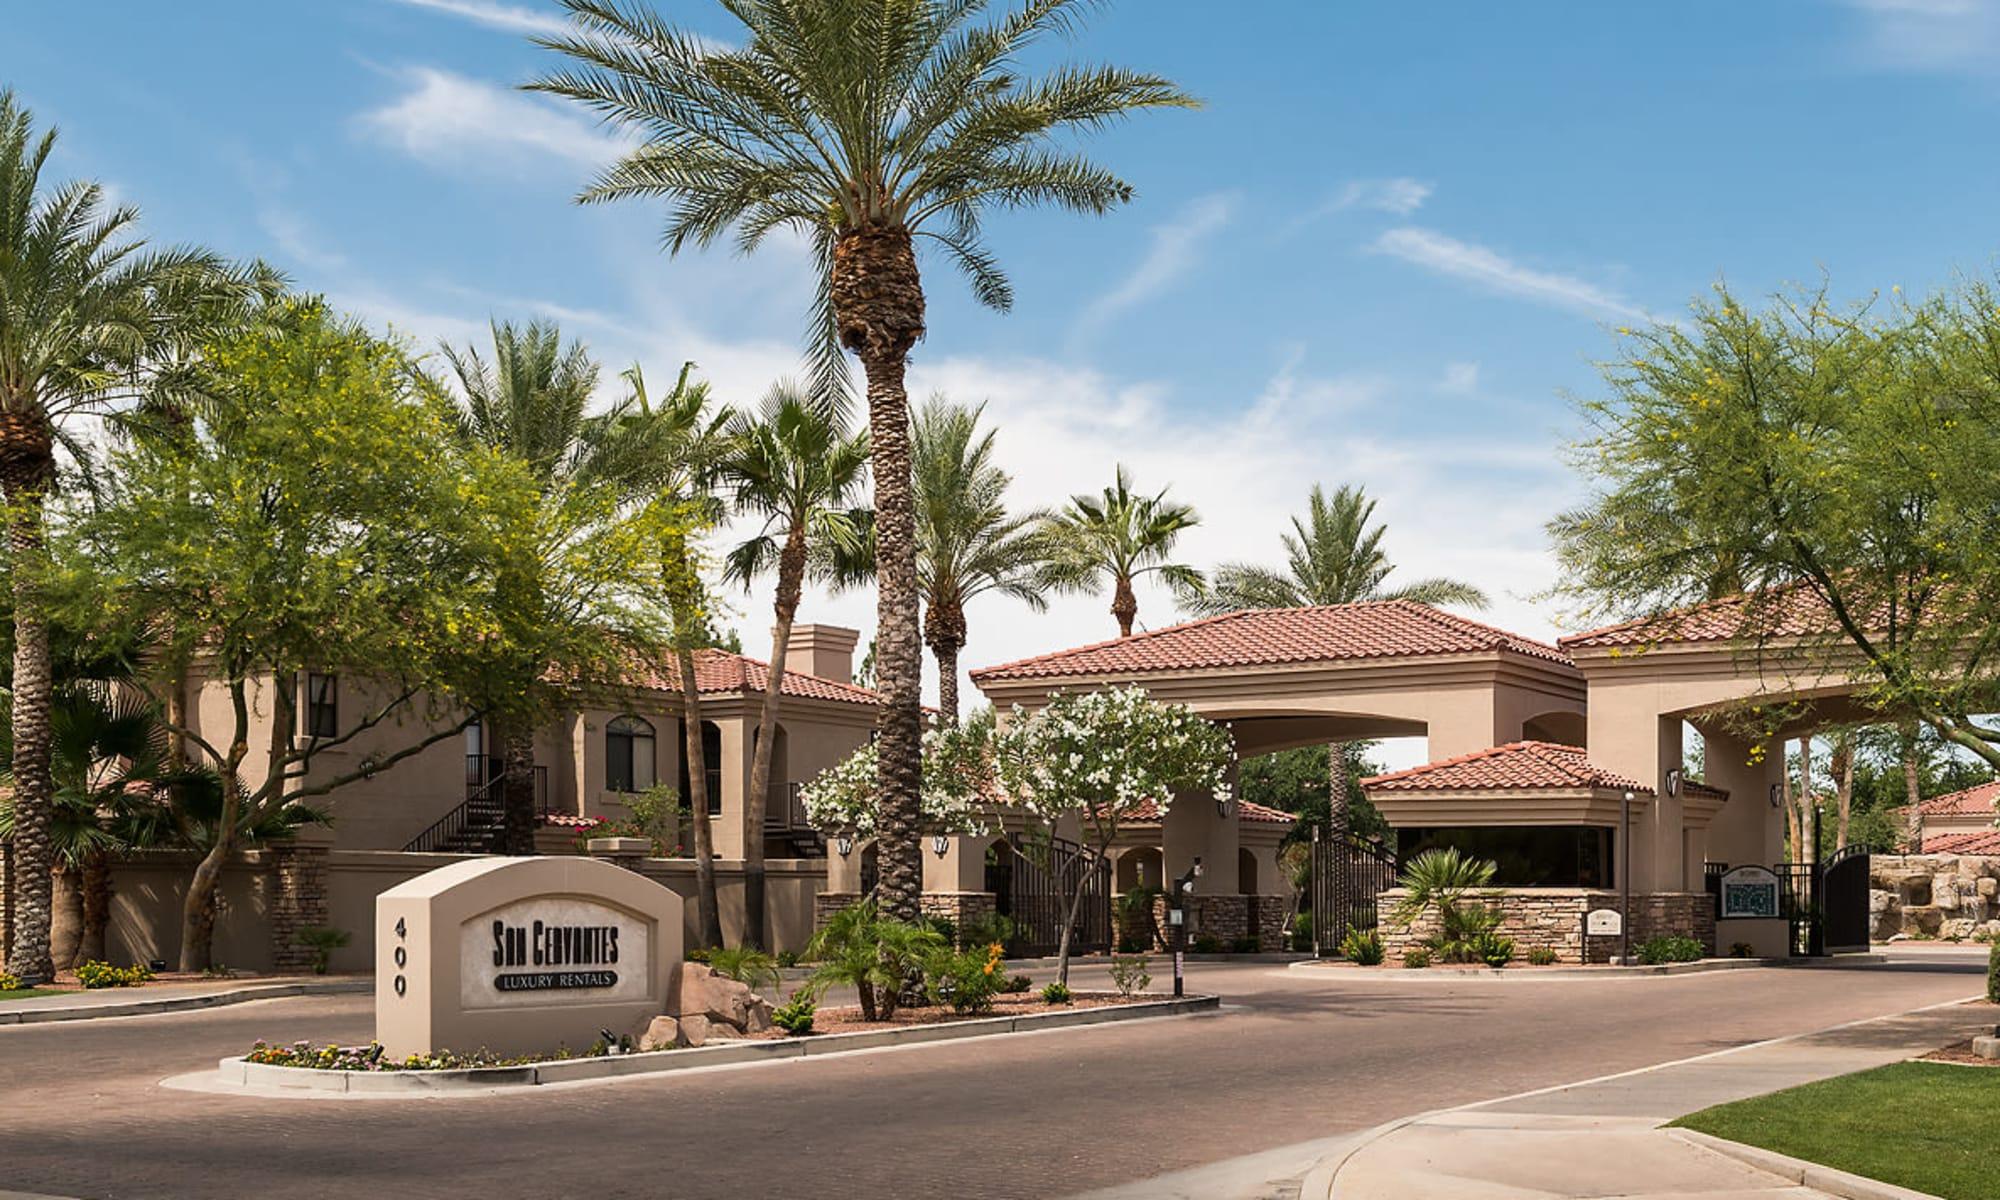 Apartments at San Cervantes in Chandler, Arizona